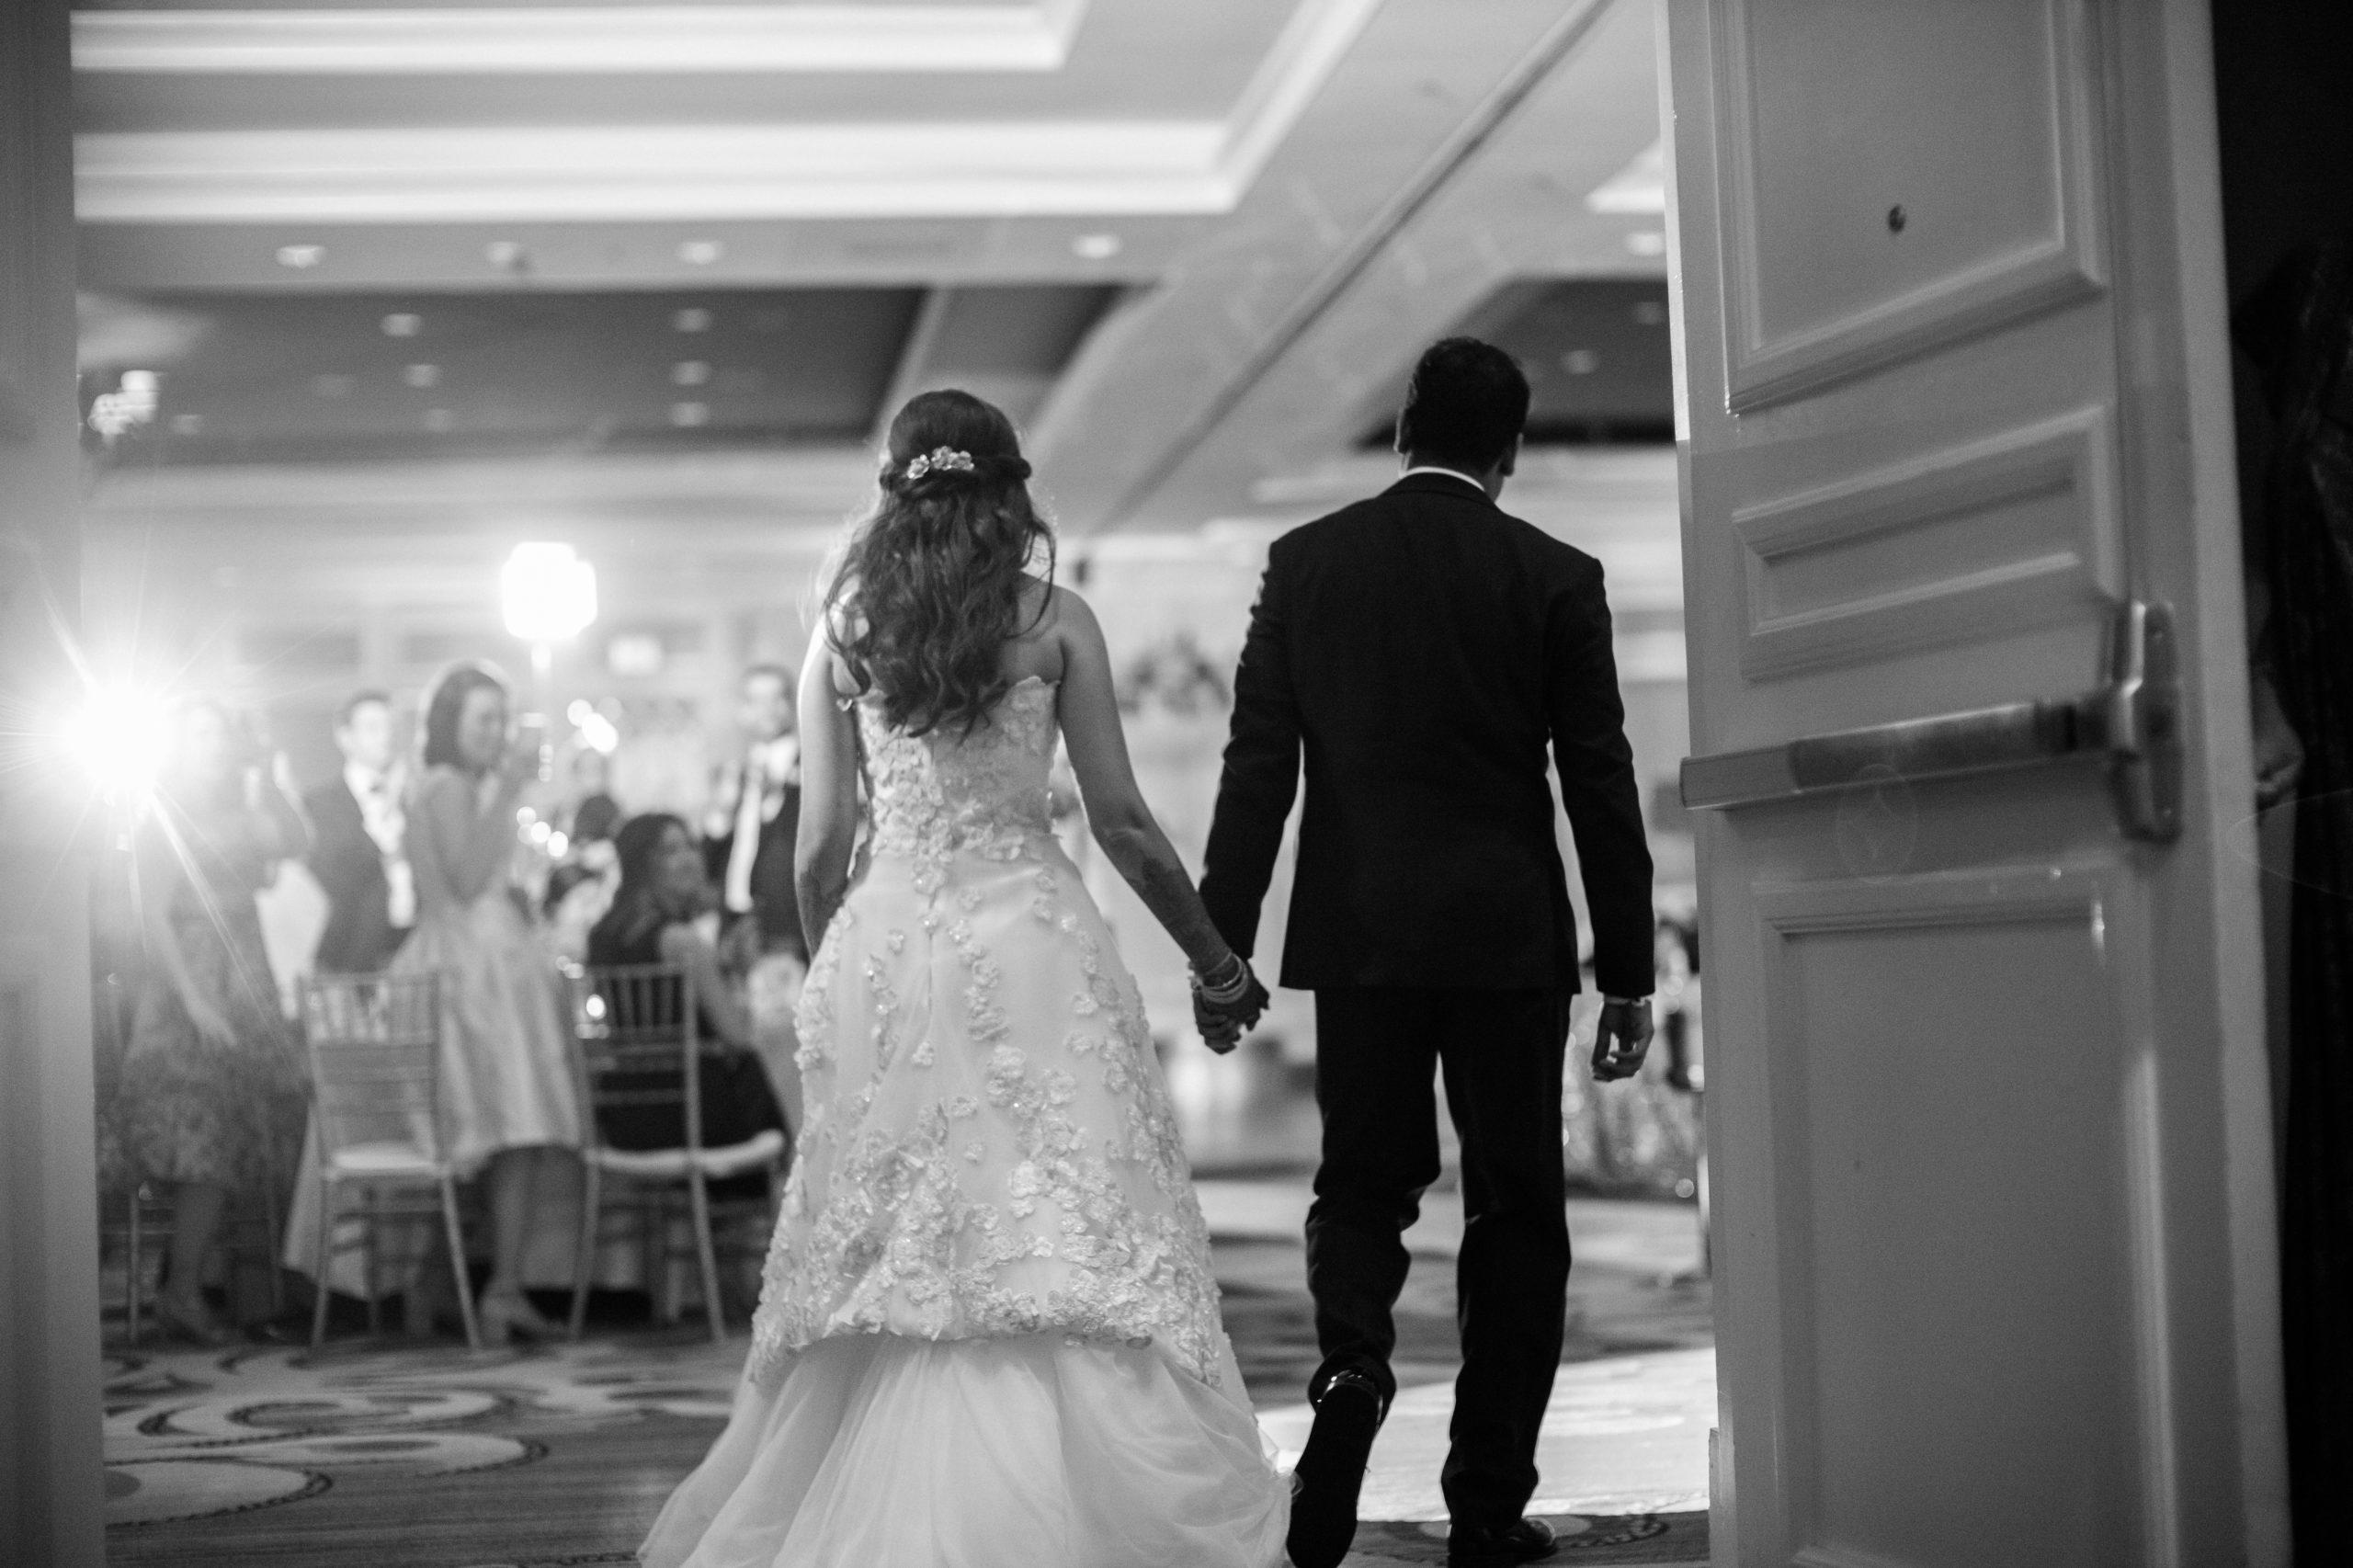 Couple reception entrance Hindu Jewish fusion wedding Sugar Land Marriott Hotel Texas-079